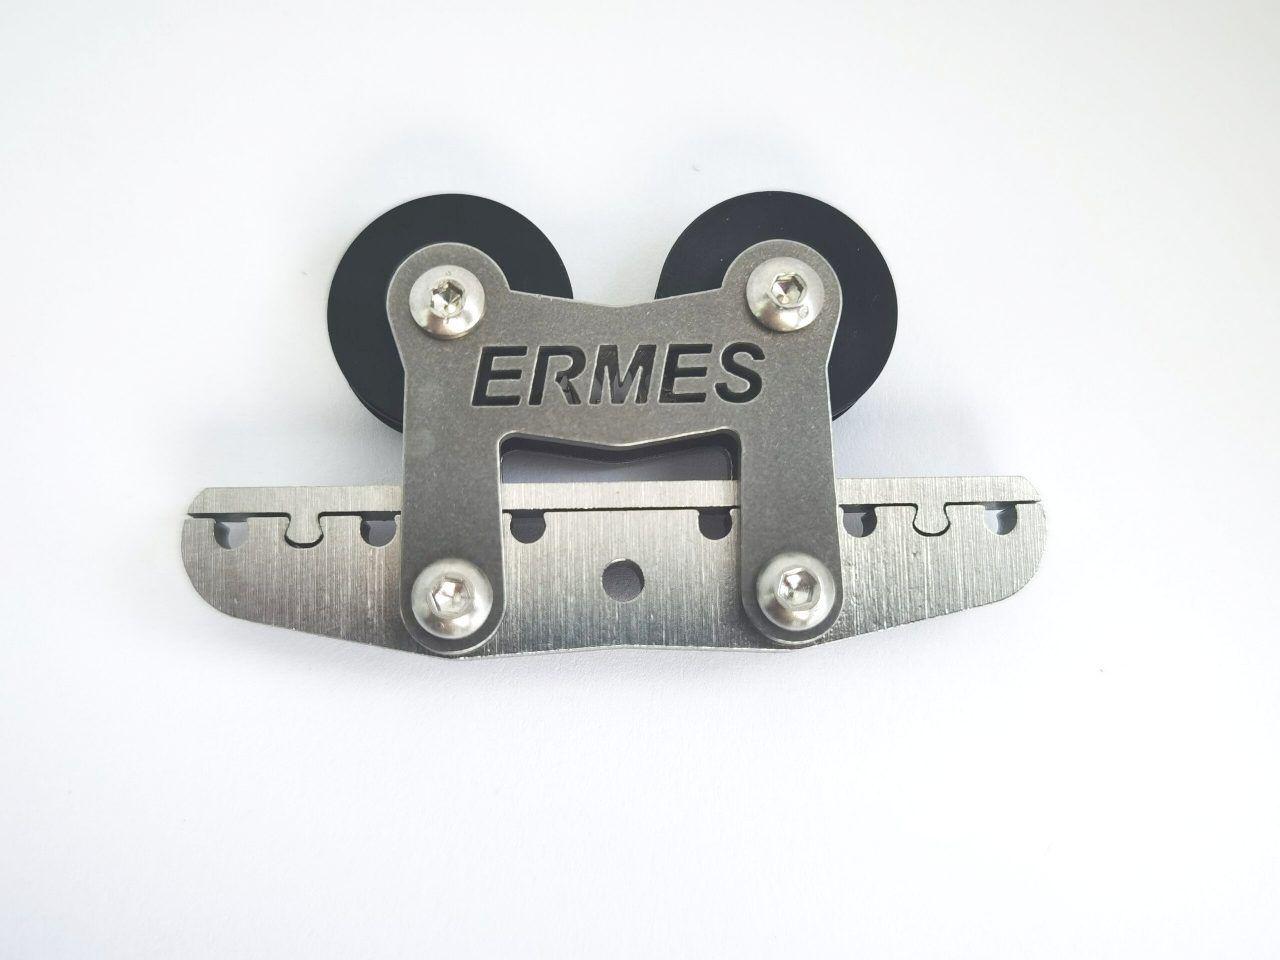 Block 6 + 1 Ermes Sub